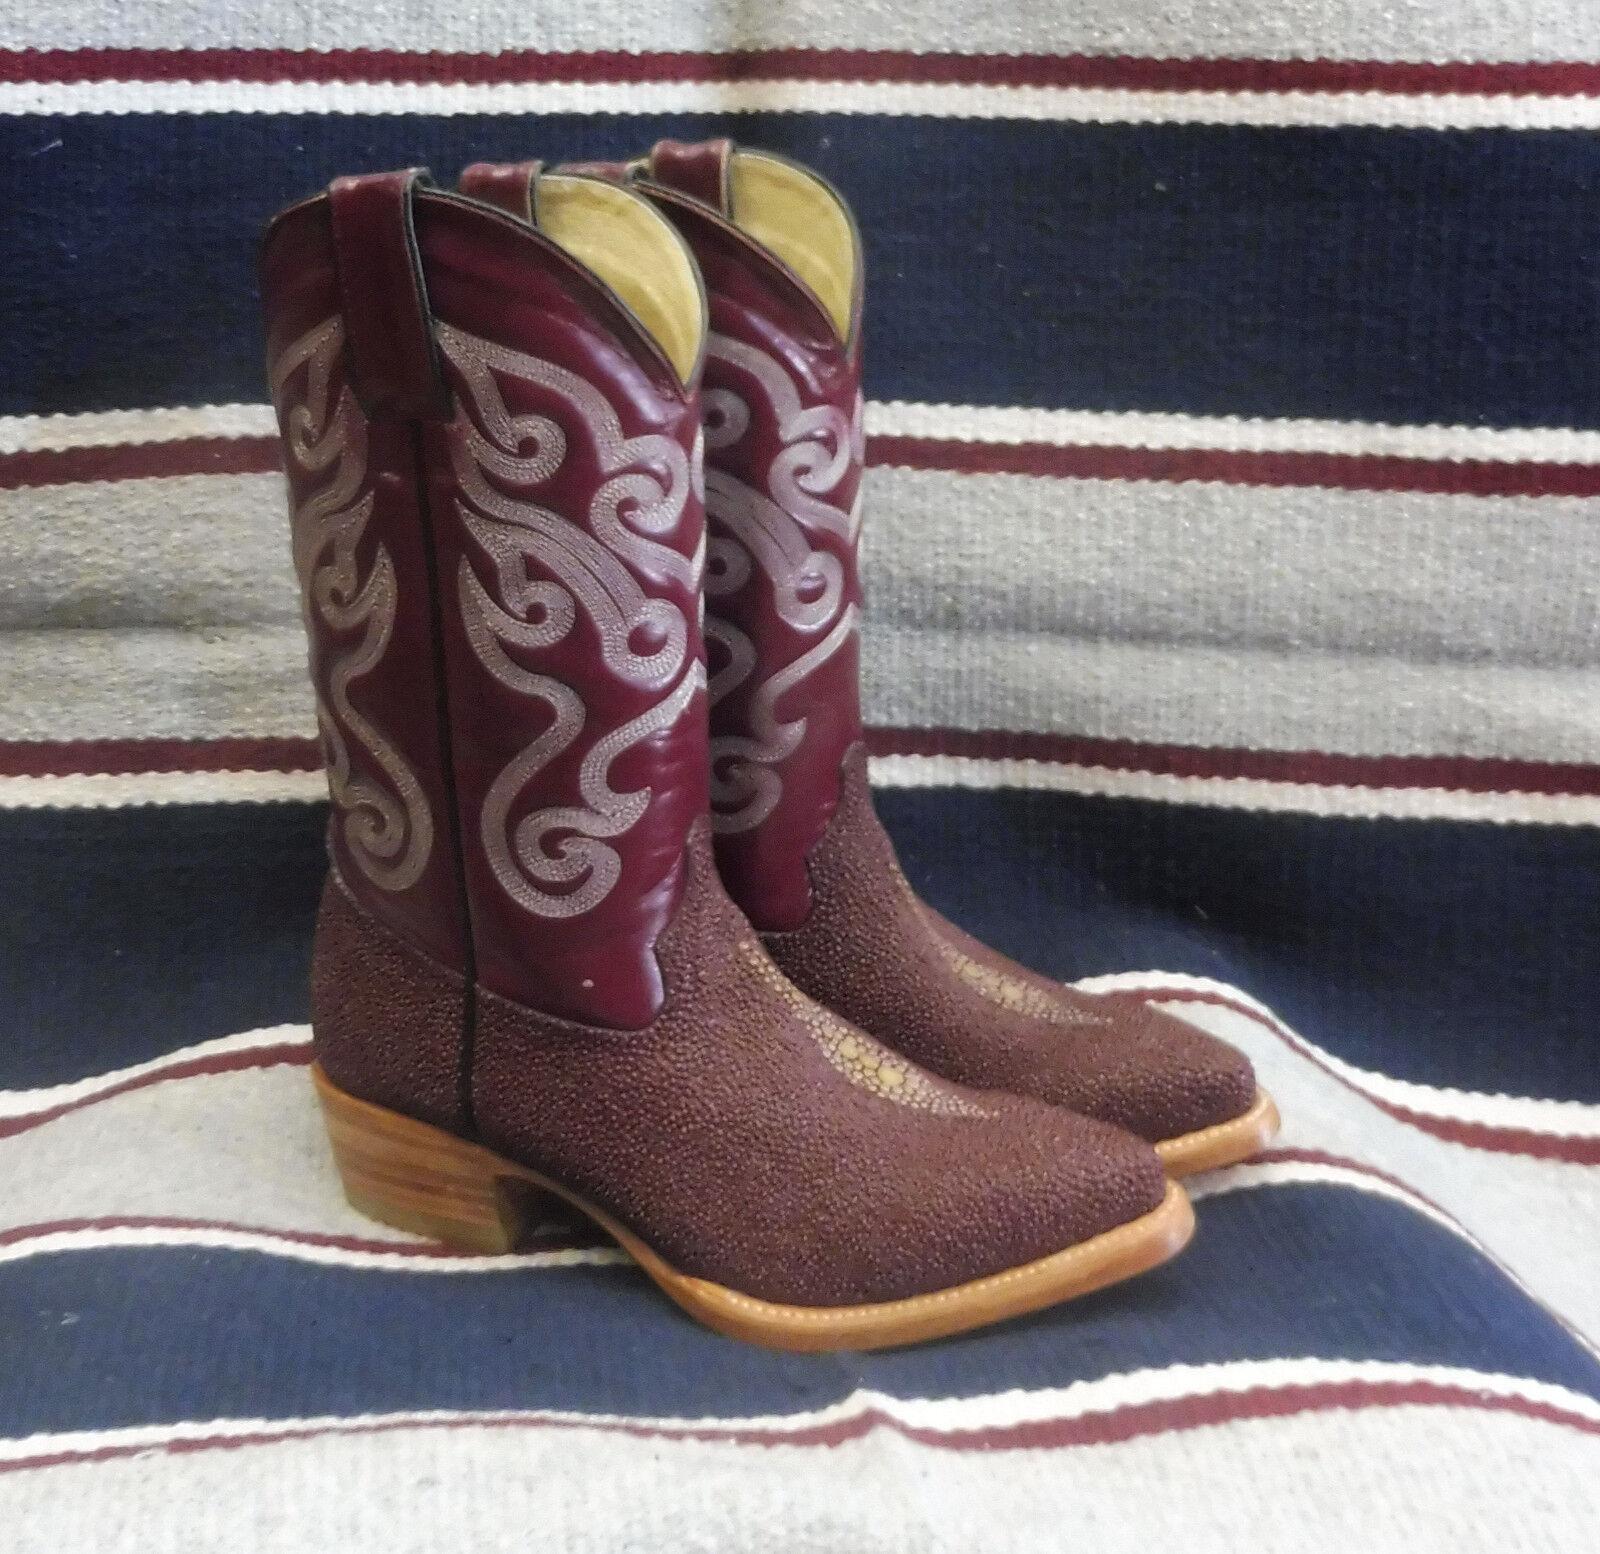 Stivali texani country western cowboy donna dance esotico bordeaux 35.5 e 36